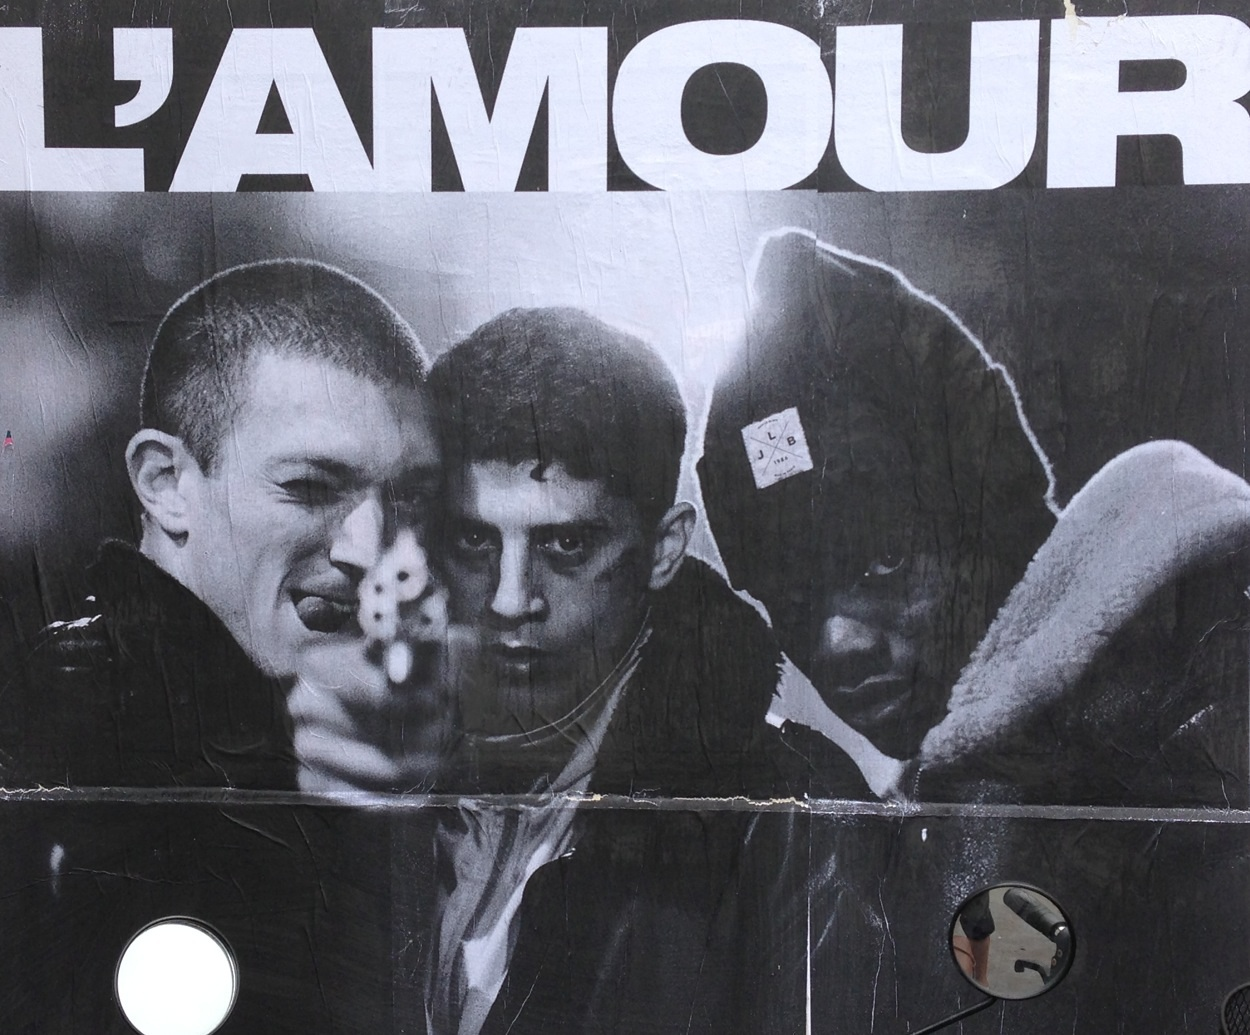 "Cartell que es pot veure a les parets parisines, emulant el film ""La Haine"" (L'odi), de Mathieu Kassovitz (1995) / X. Espinet"